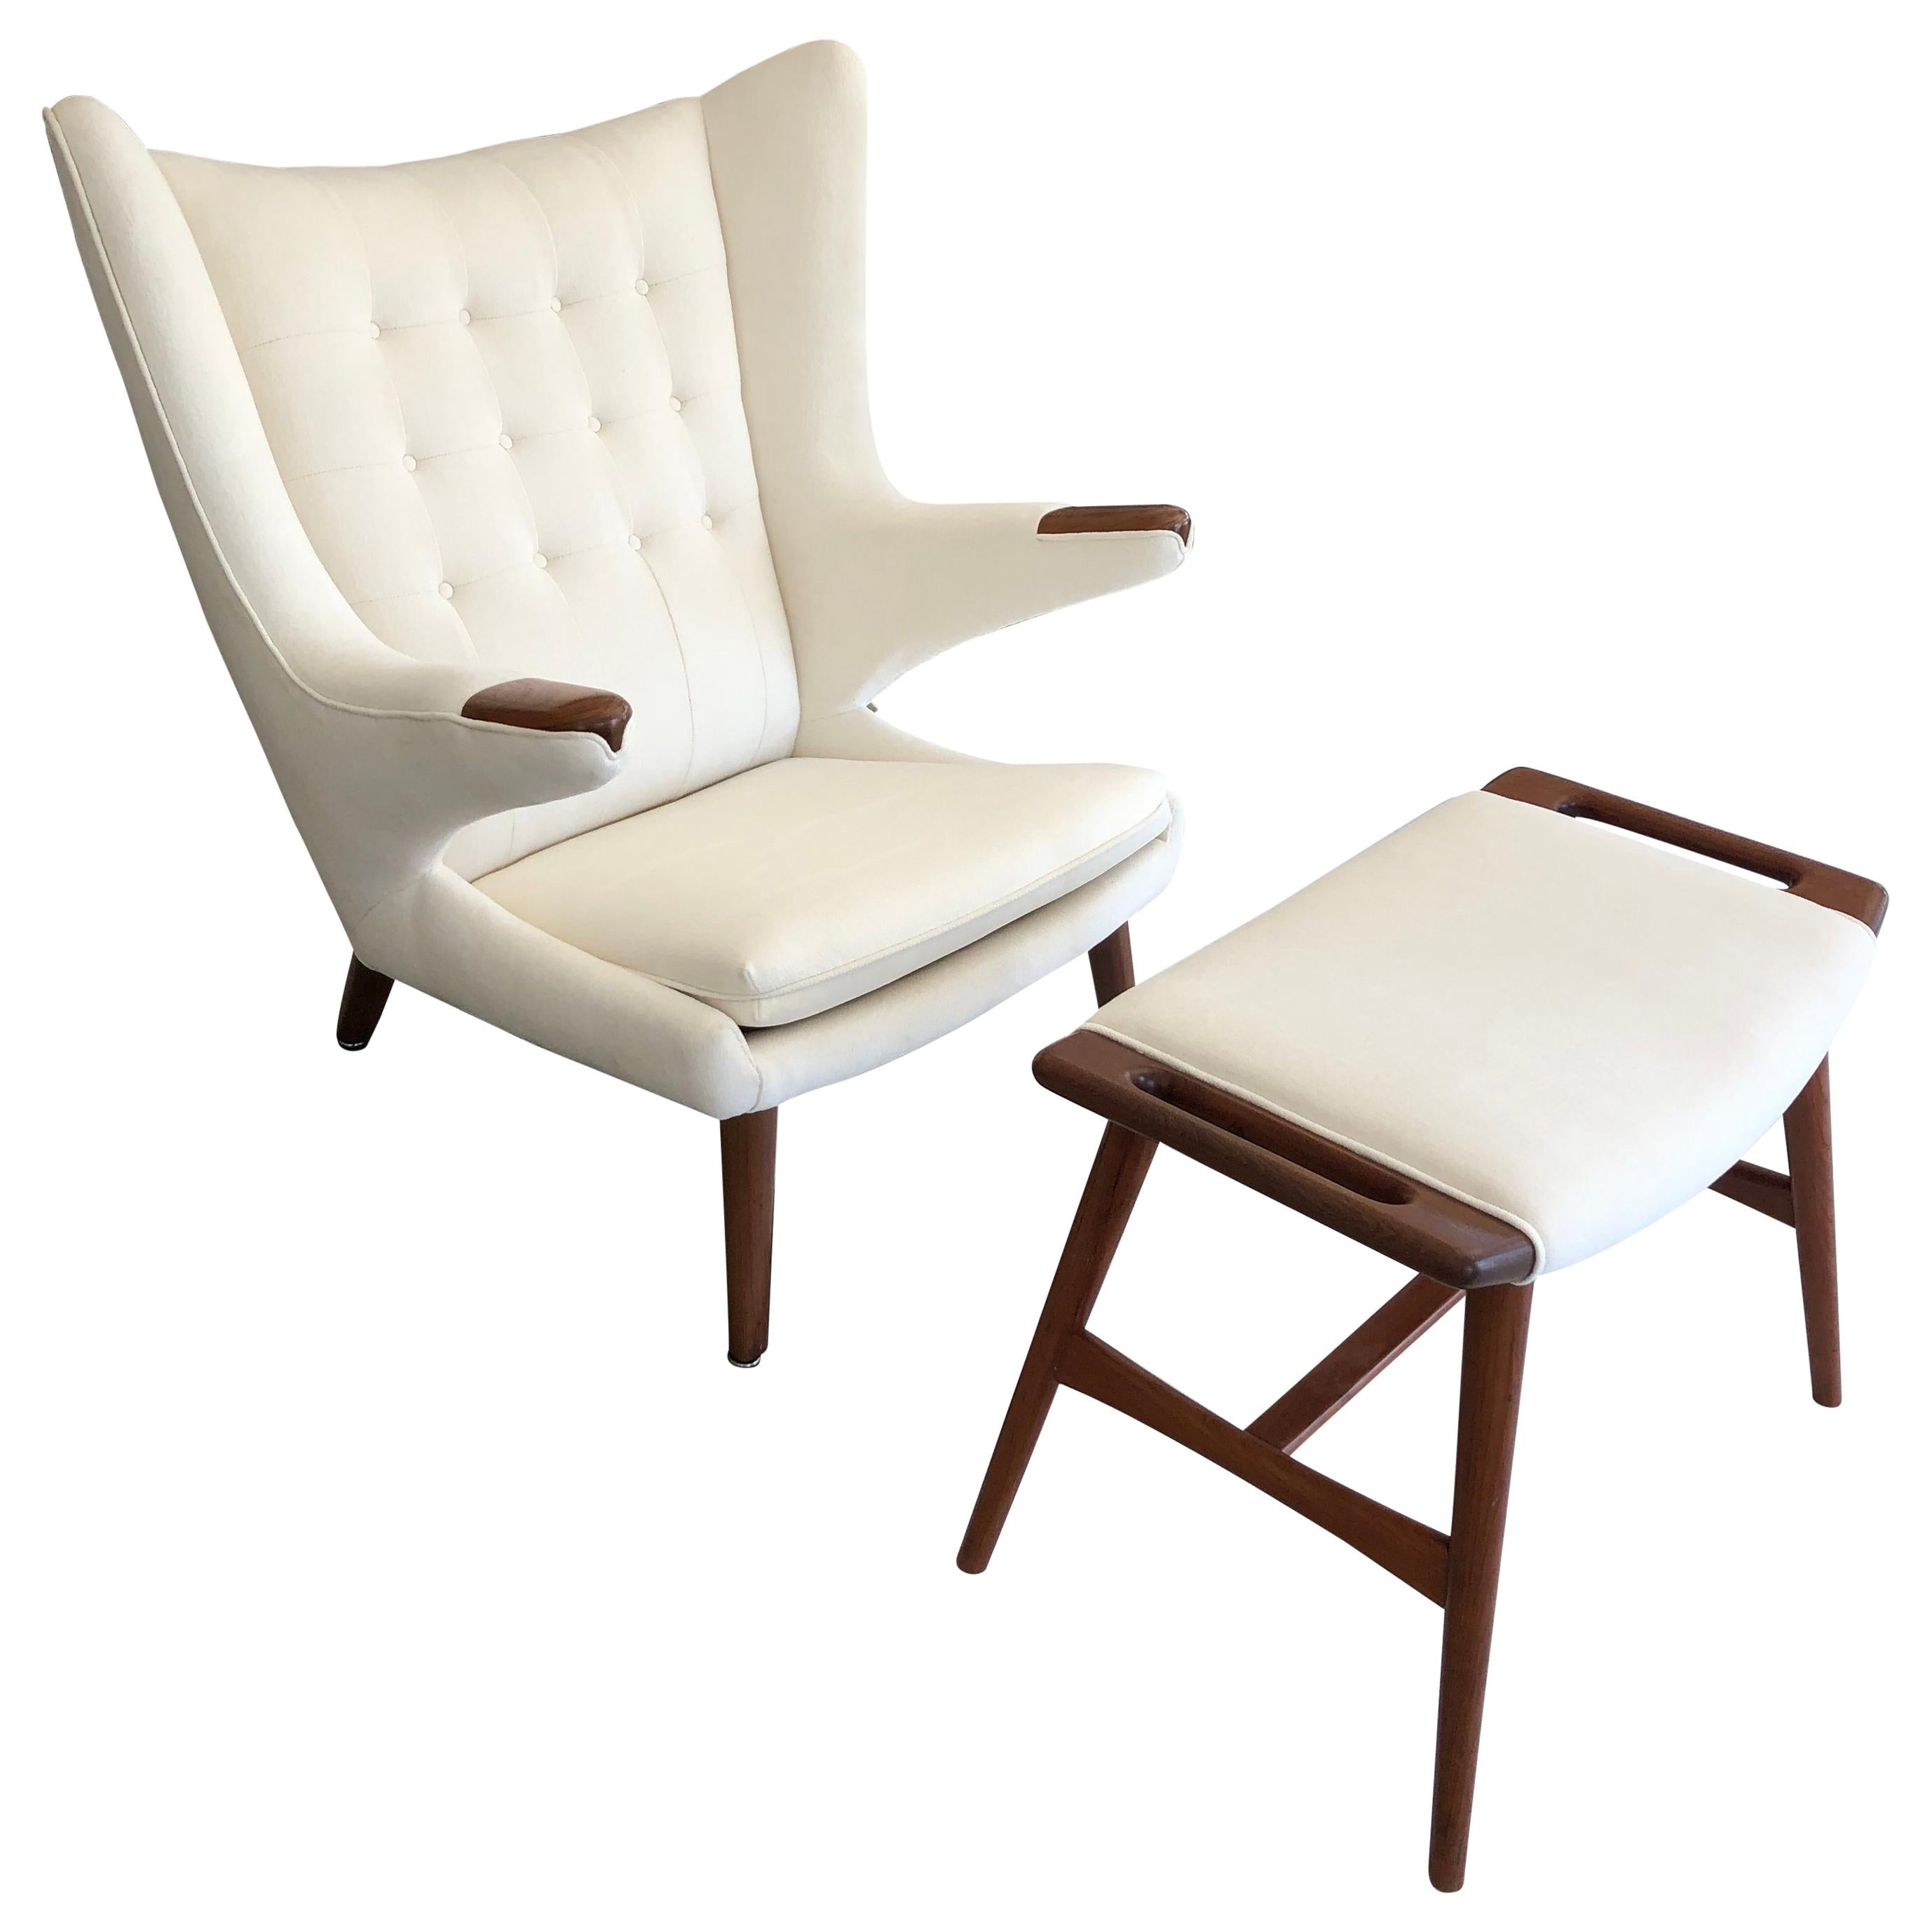 Astonishing Hans Wegner Papa Bear Chair With Ottoman Ibusinesslaw Wood Chair Design Ideas Ibusinesslaworg